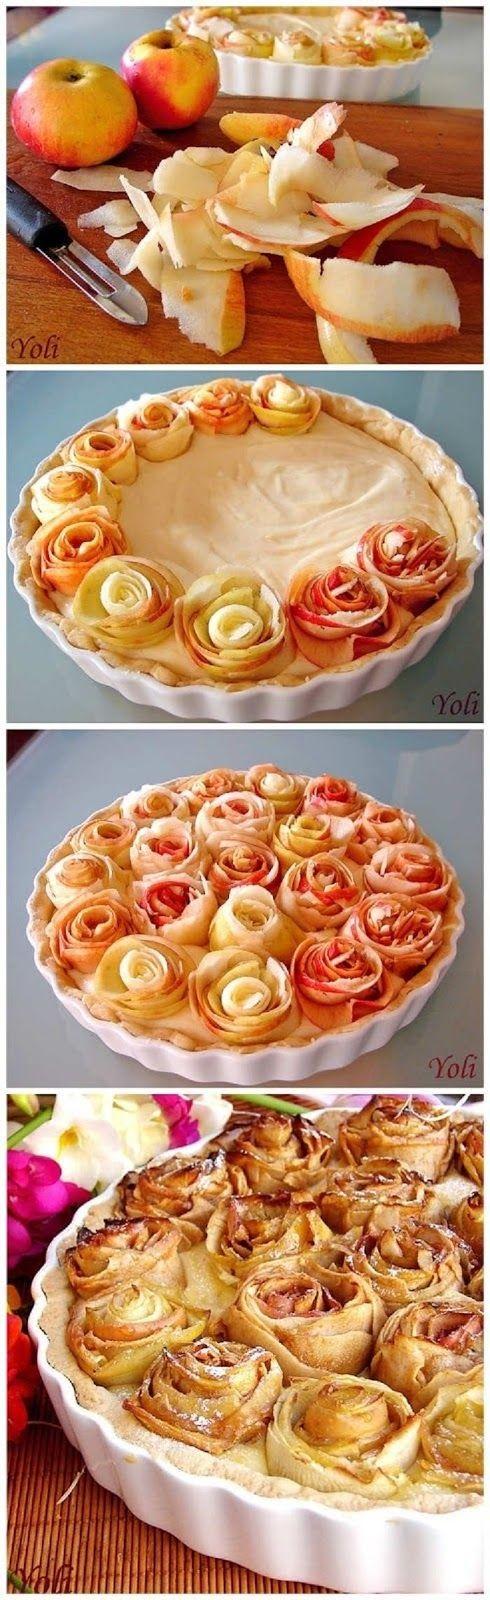 DIY Flower Apple Pie, gorgeous!